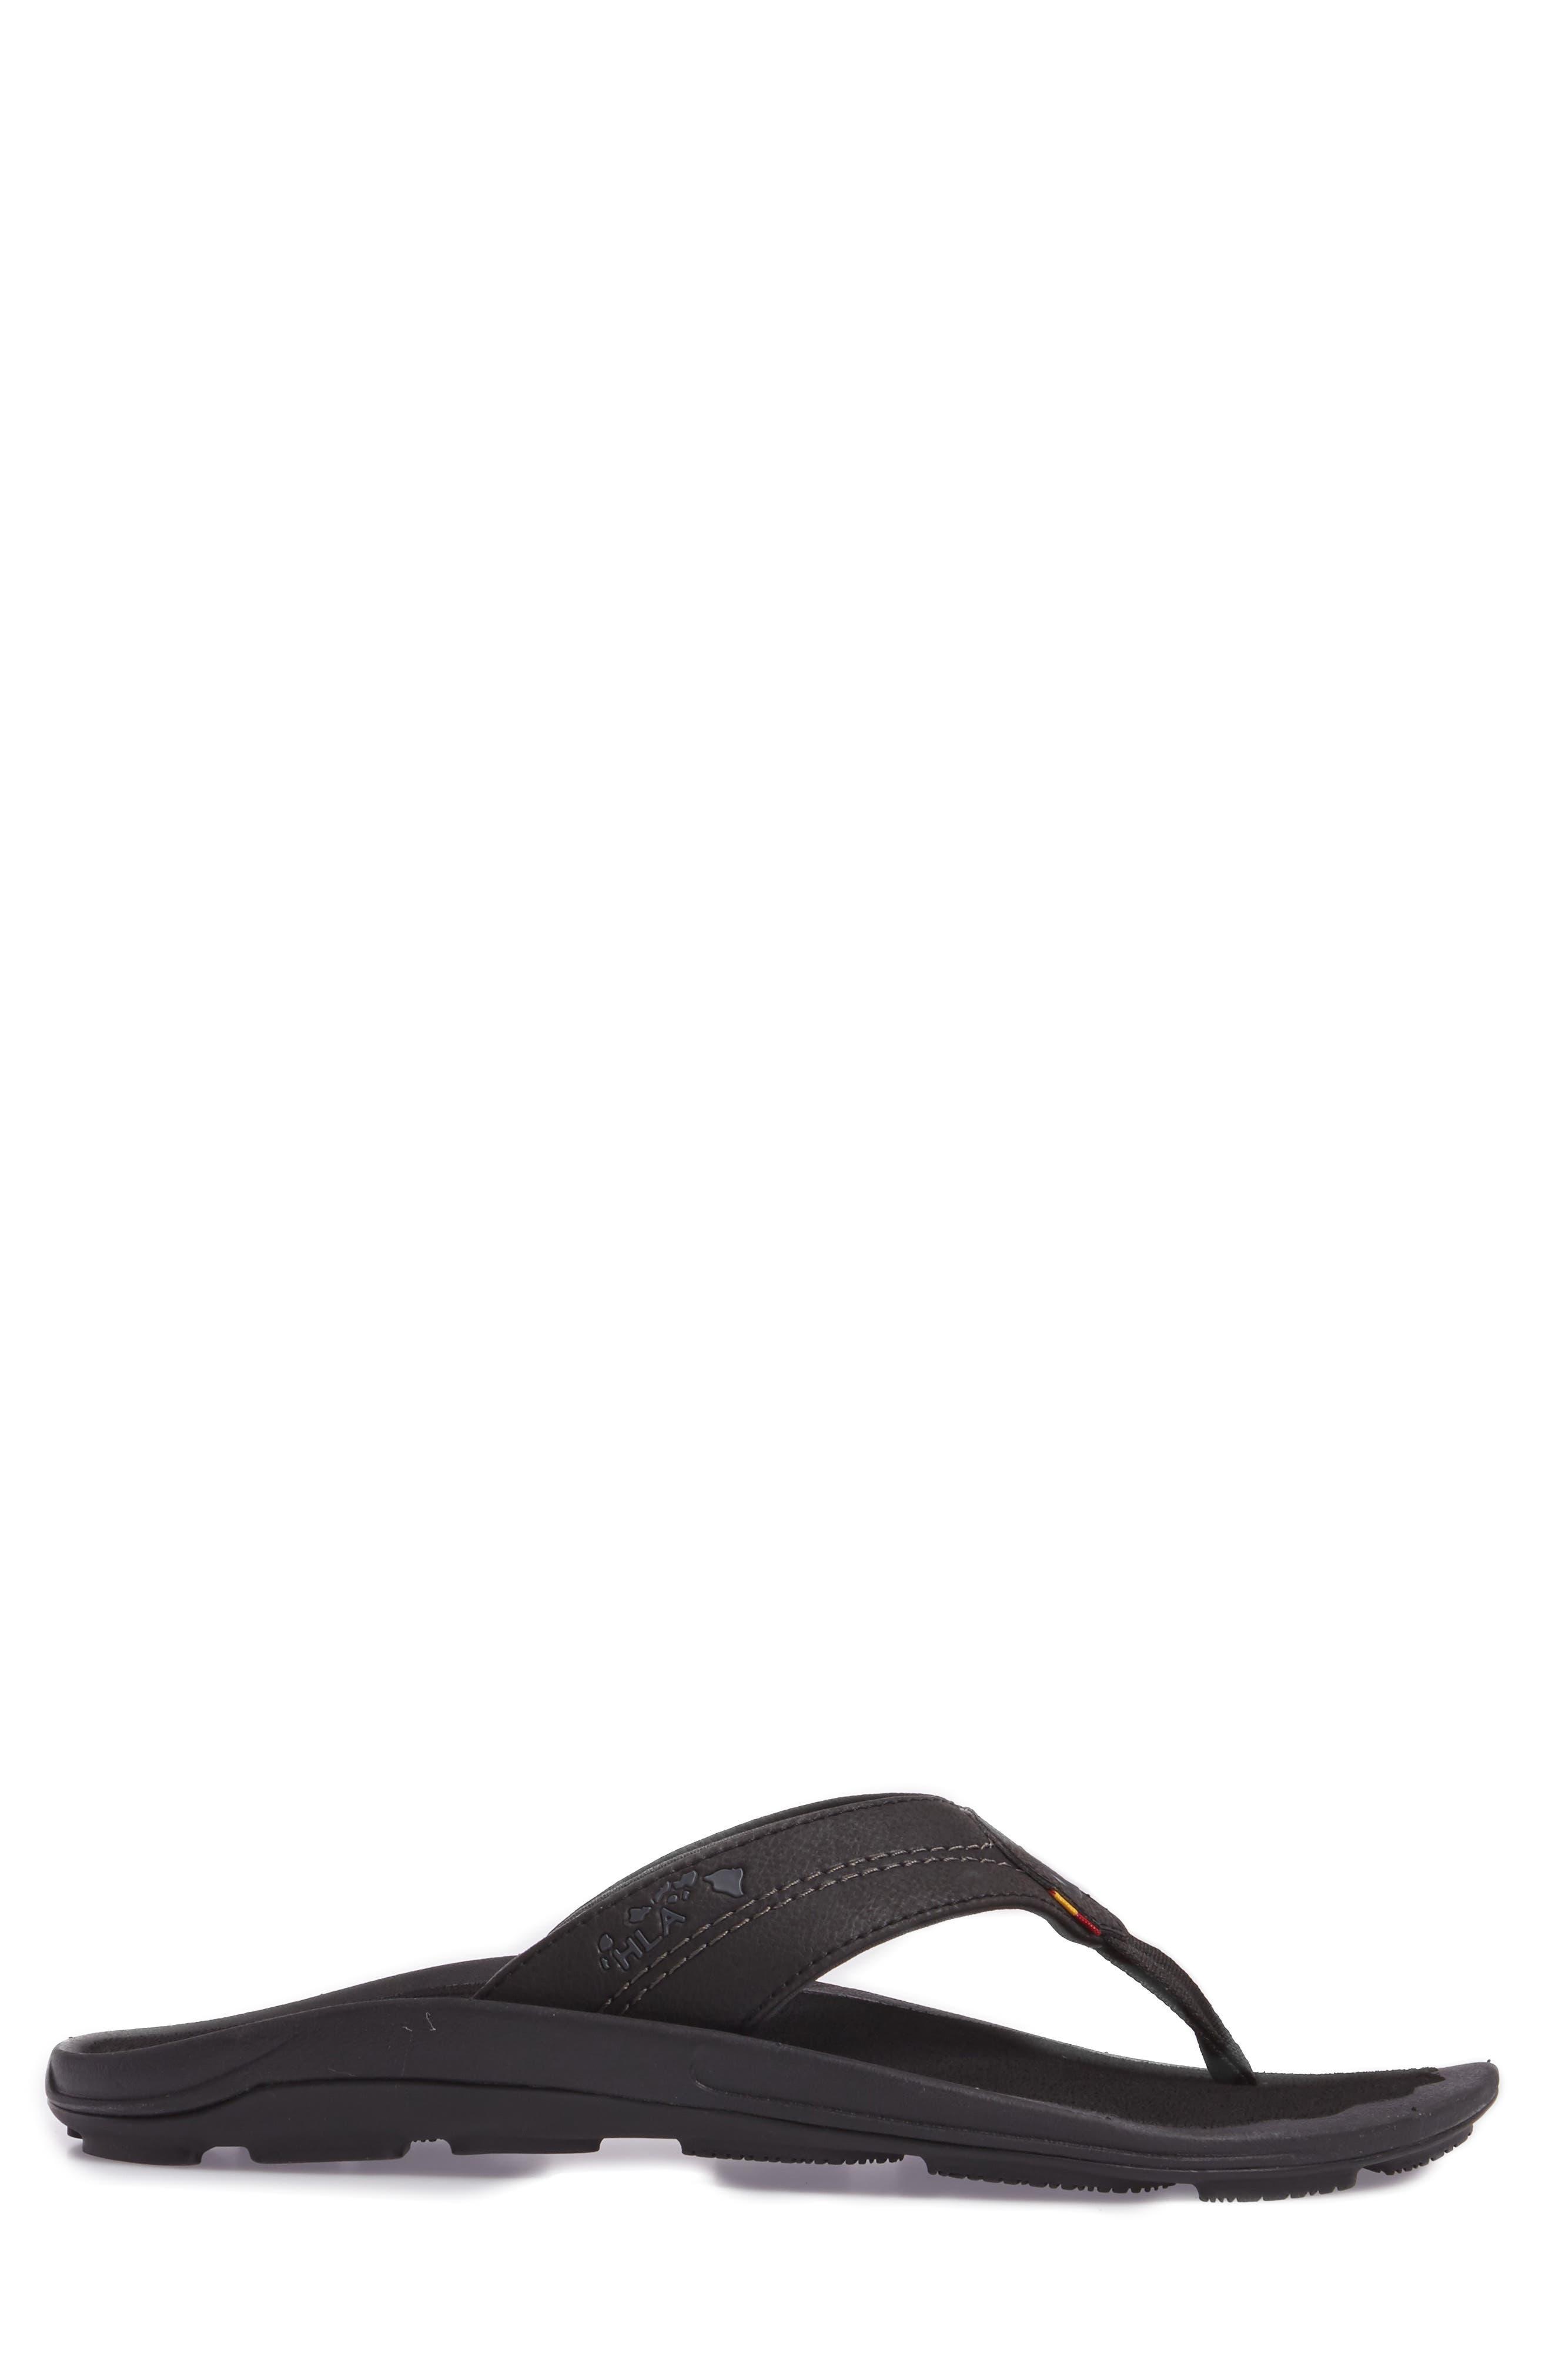 Kipi Flip Flop,                             Alternate thumbnail 3, color,                             BLACK/ BLACK